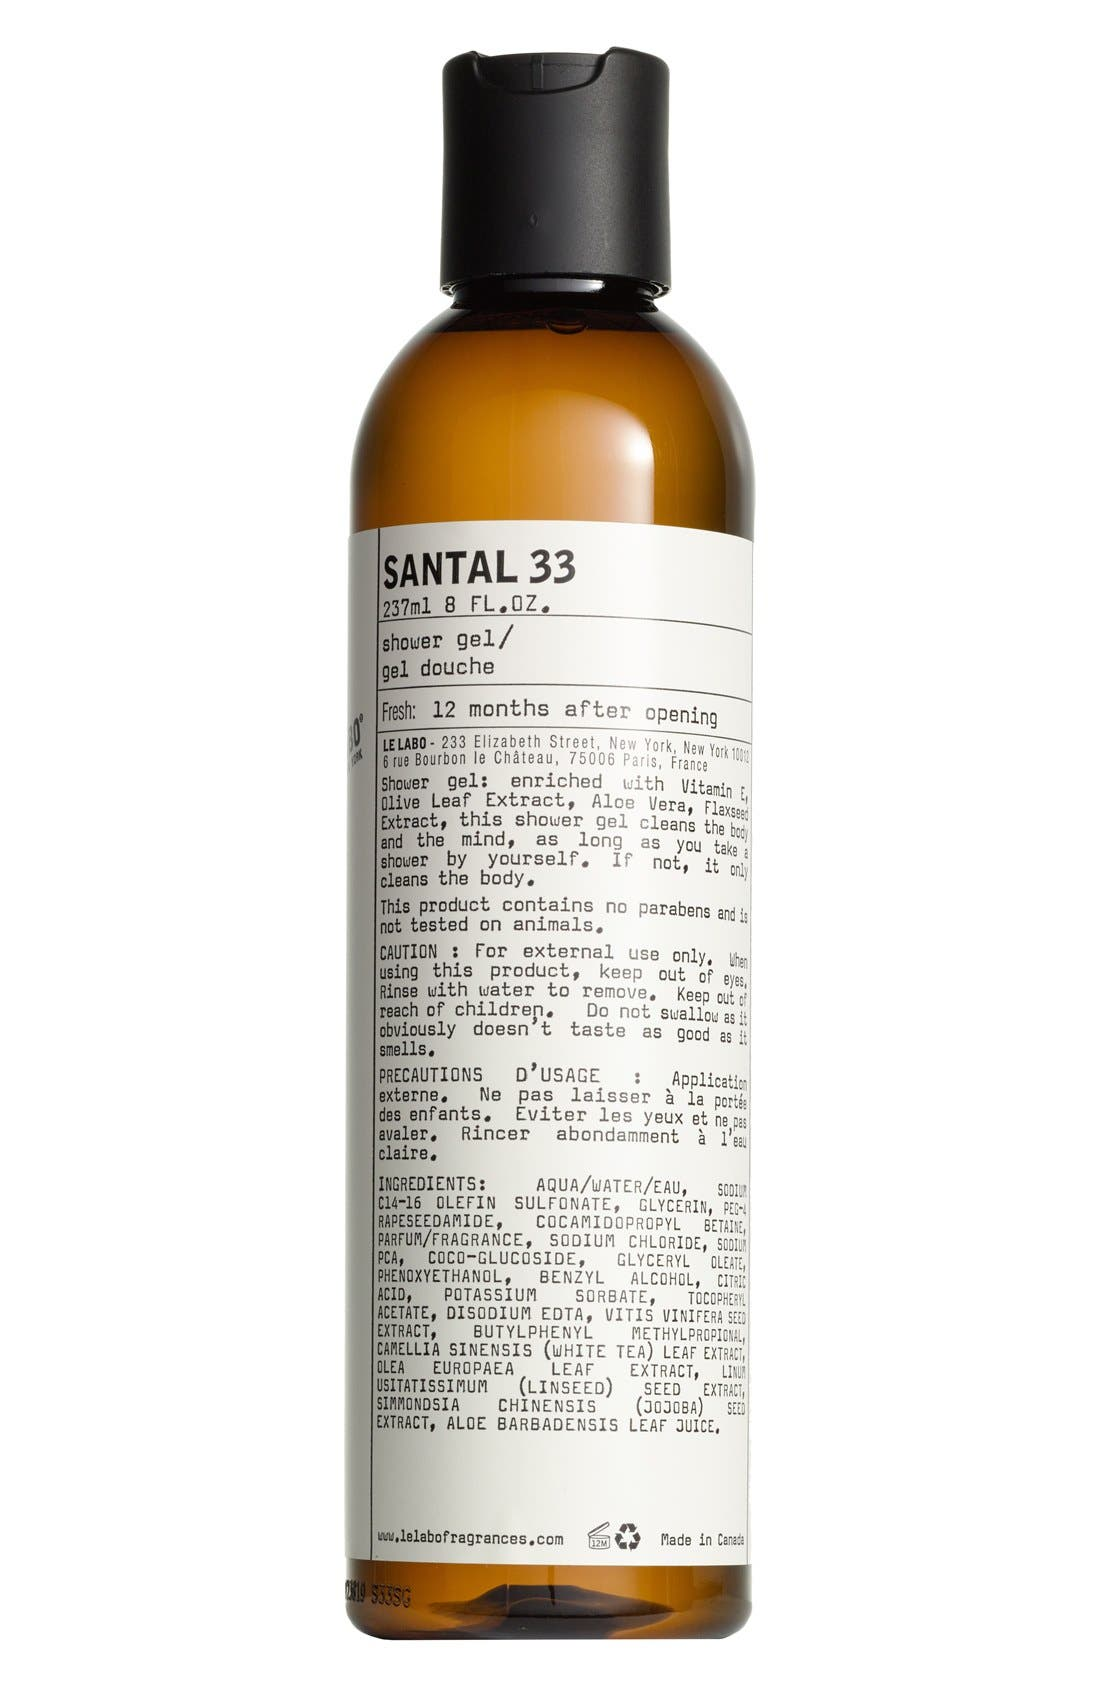 Santal 33 Shower Gel